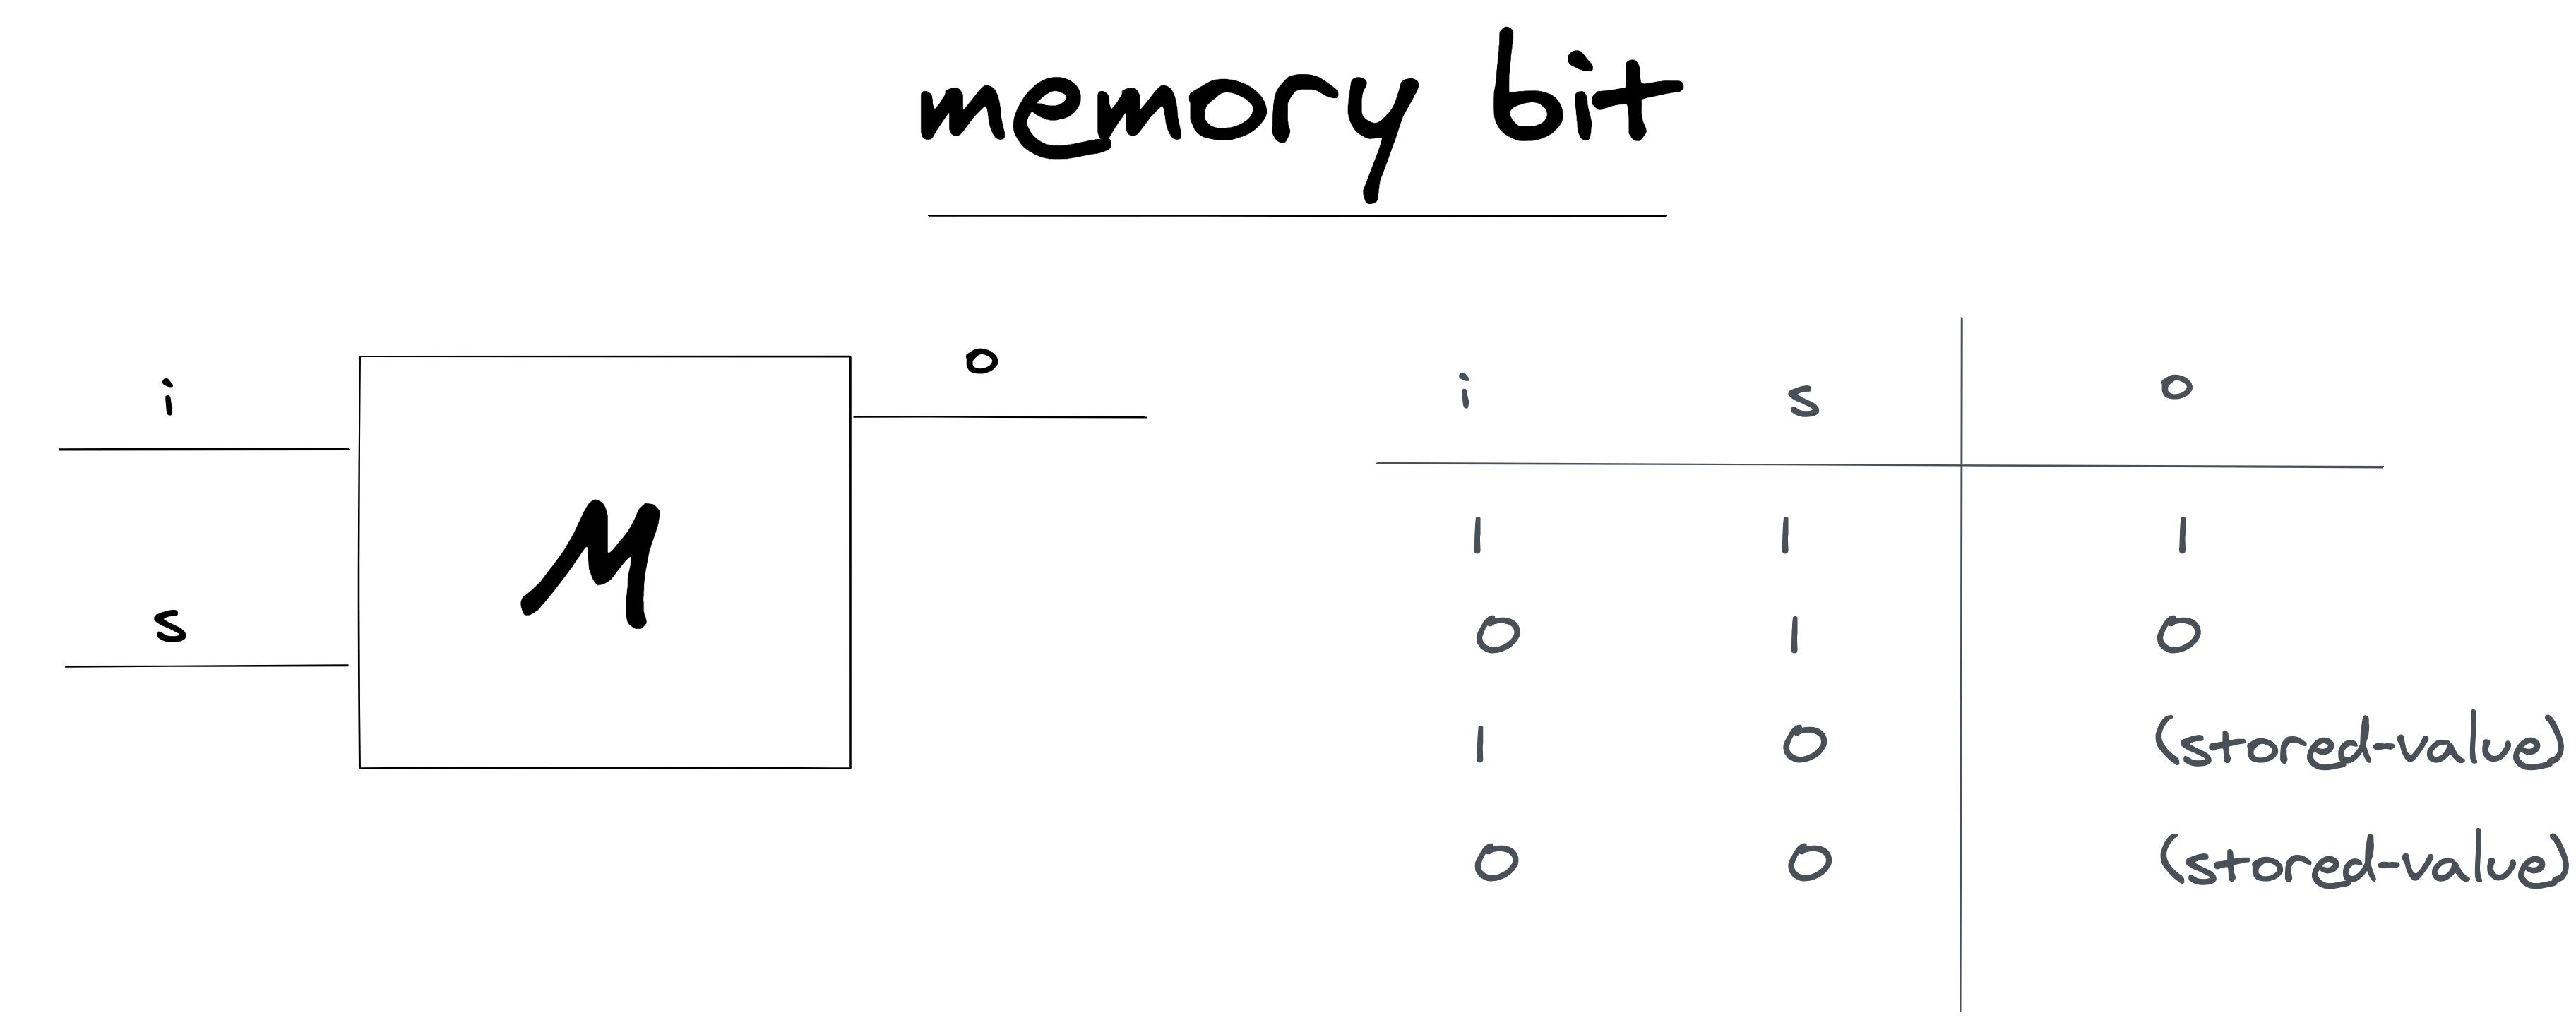 umair-akbar-aHR0cHM6Ly91c2VyLWltYWdlcy5naXRodWJ1c2VyY29udGVudC5jb20vOTg0NTc0Lzk1Nzc2NjgxLWNiNDUzMTAwLTBjOTItMTFlYi05ZjBjLTEzNmNjZTMwOTNiYy5wbmc - Simulating RAM in Clojure